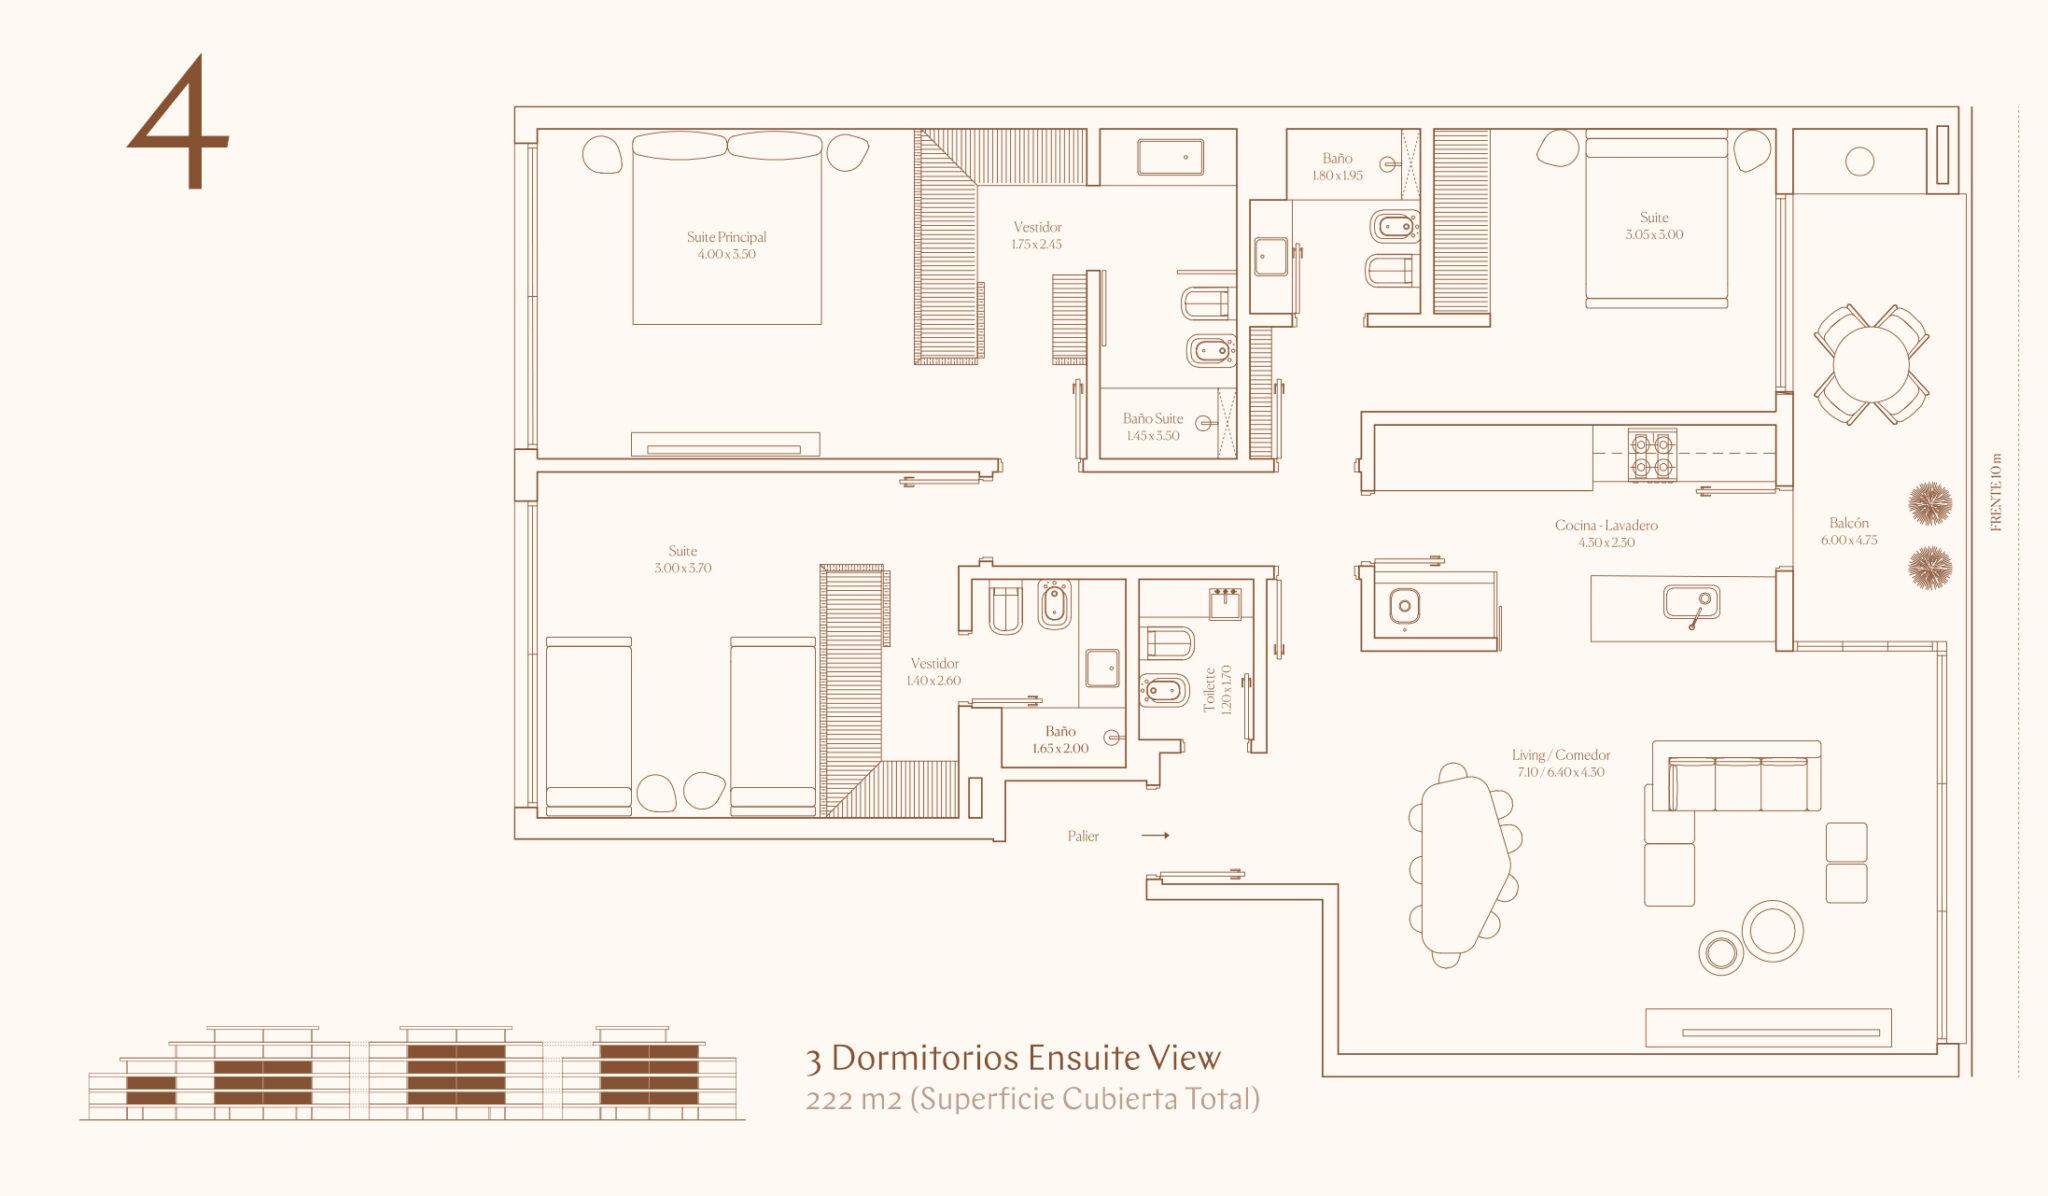 3 Dormitorios Ensuite View